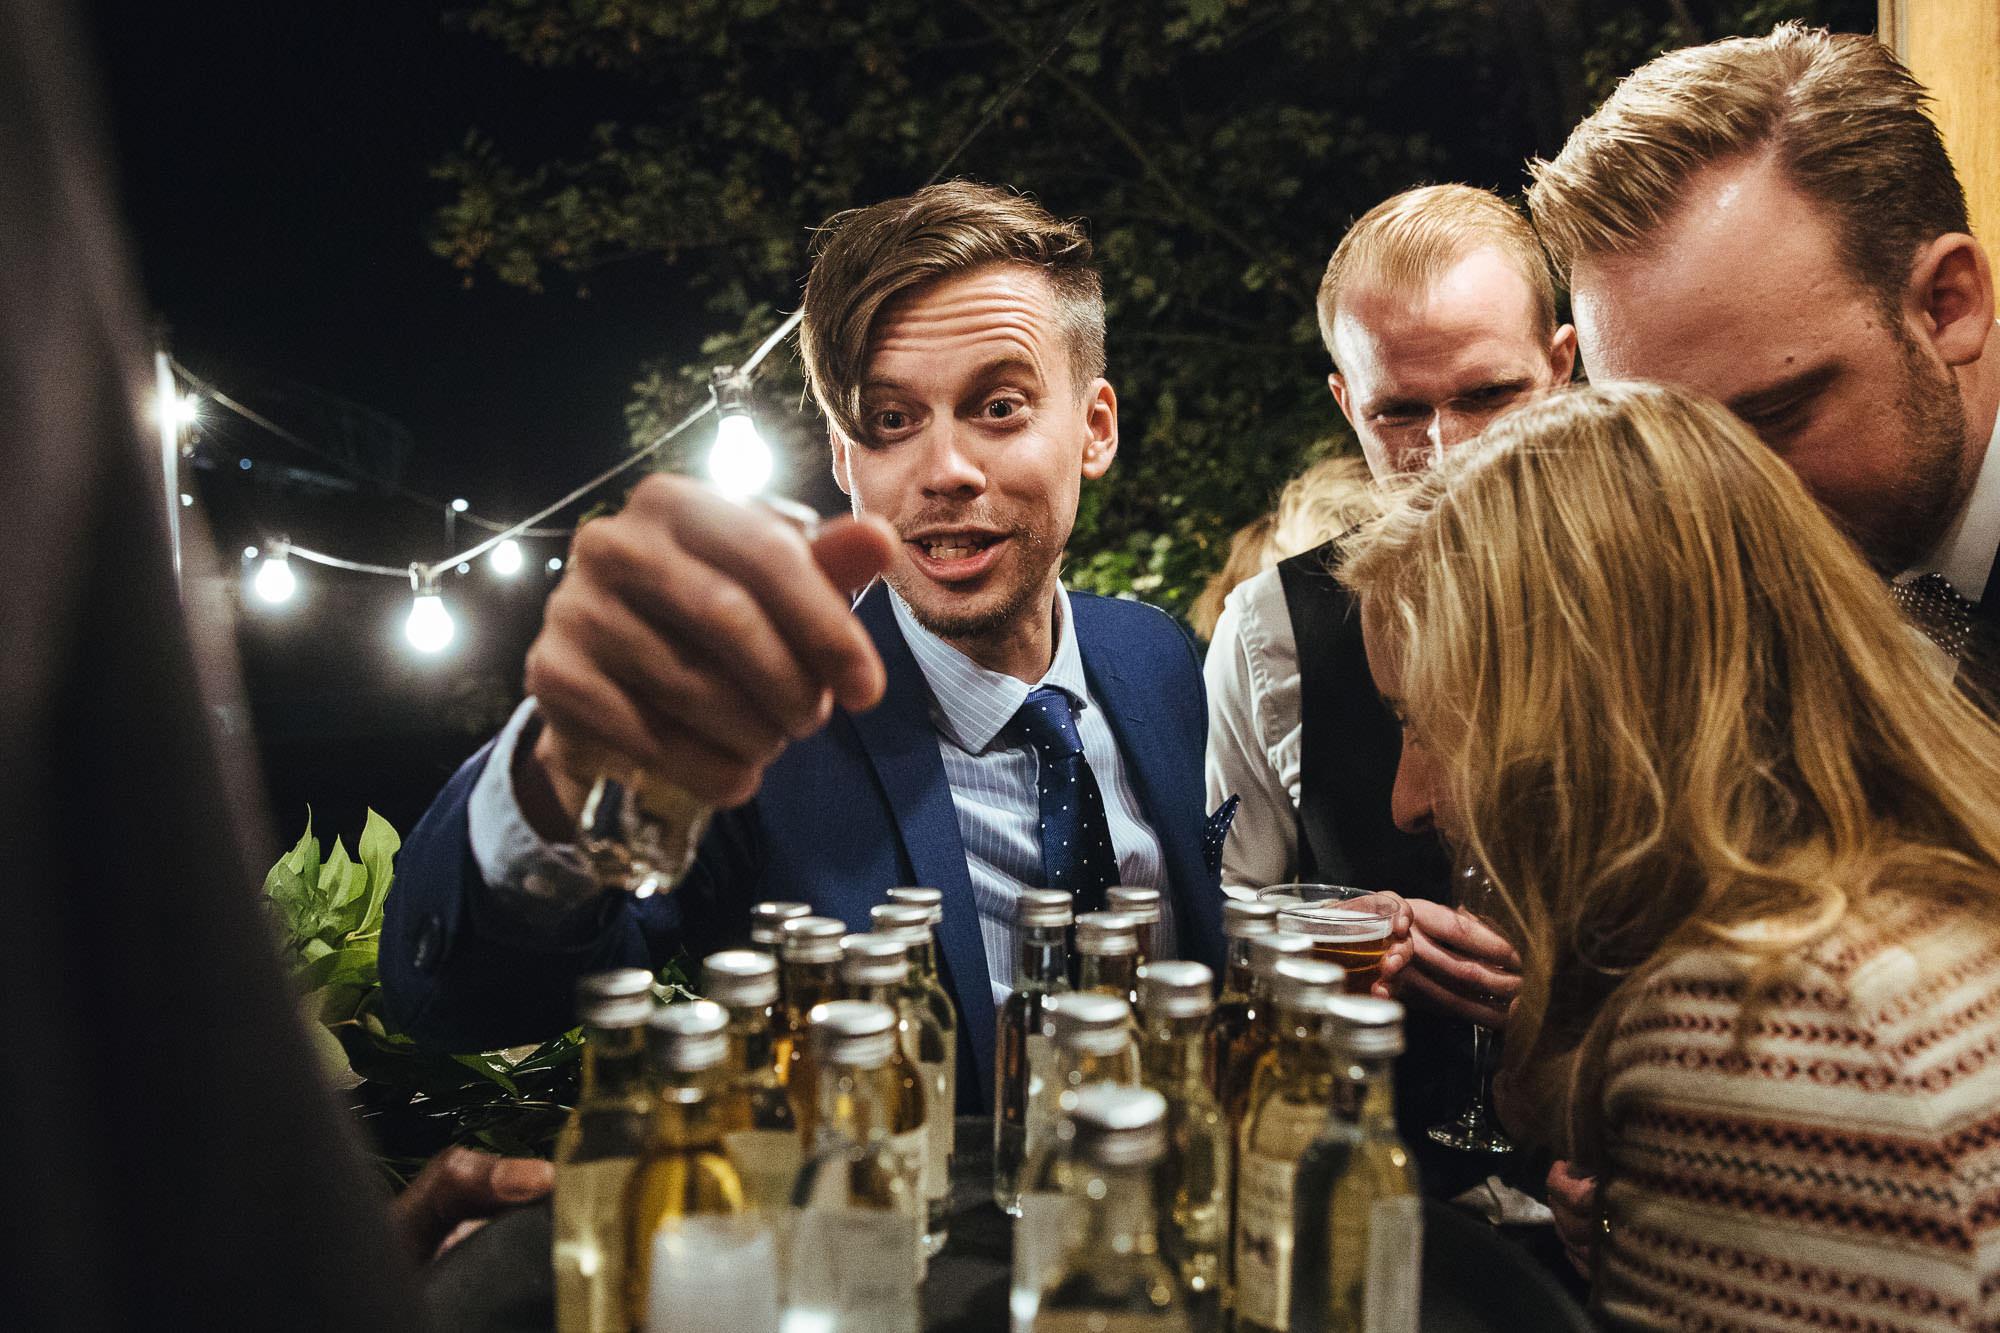 Swedish drinking games